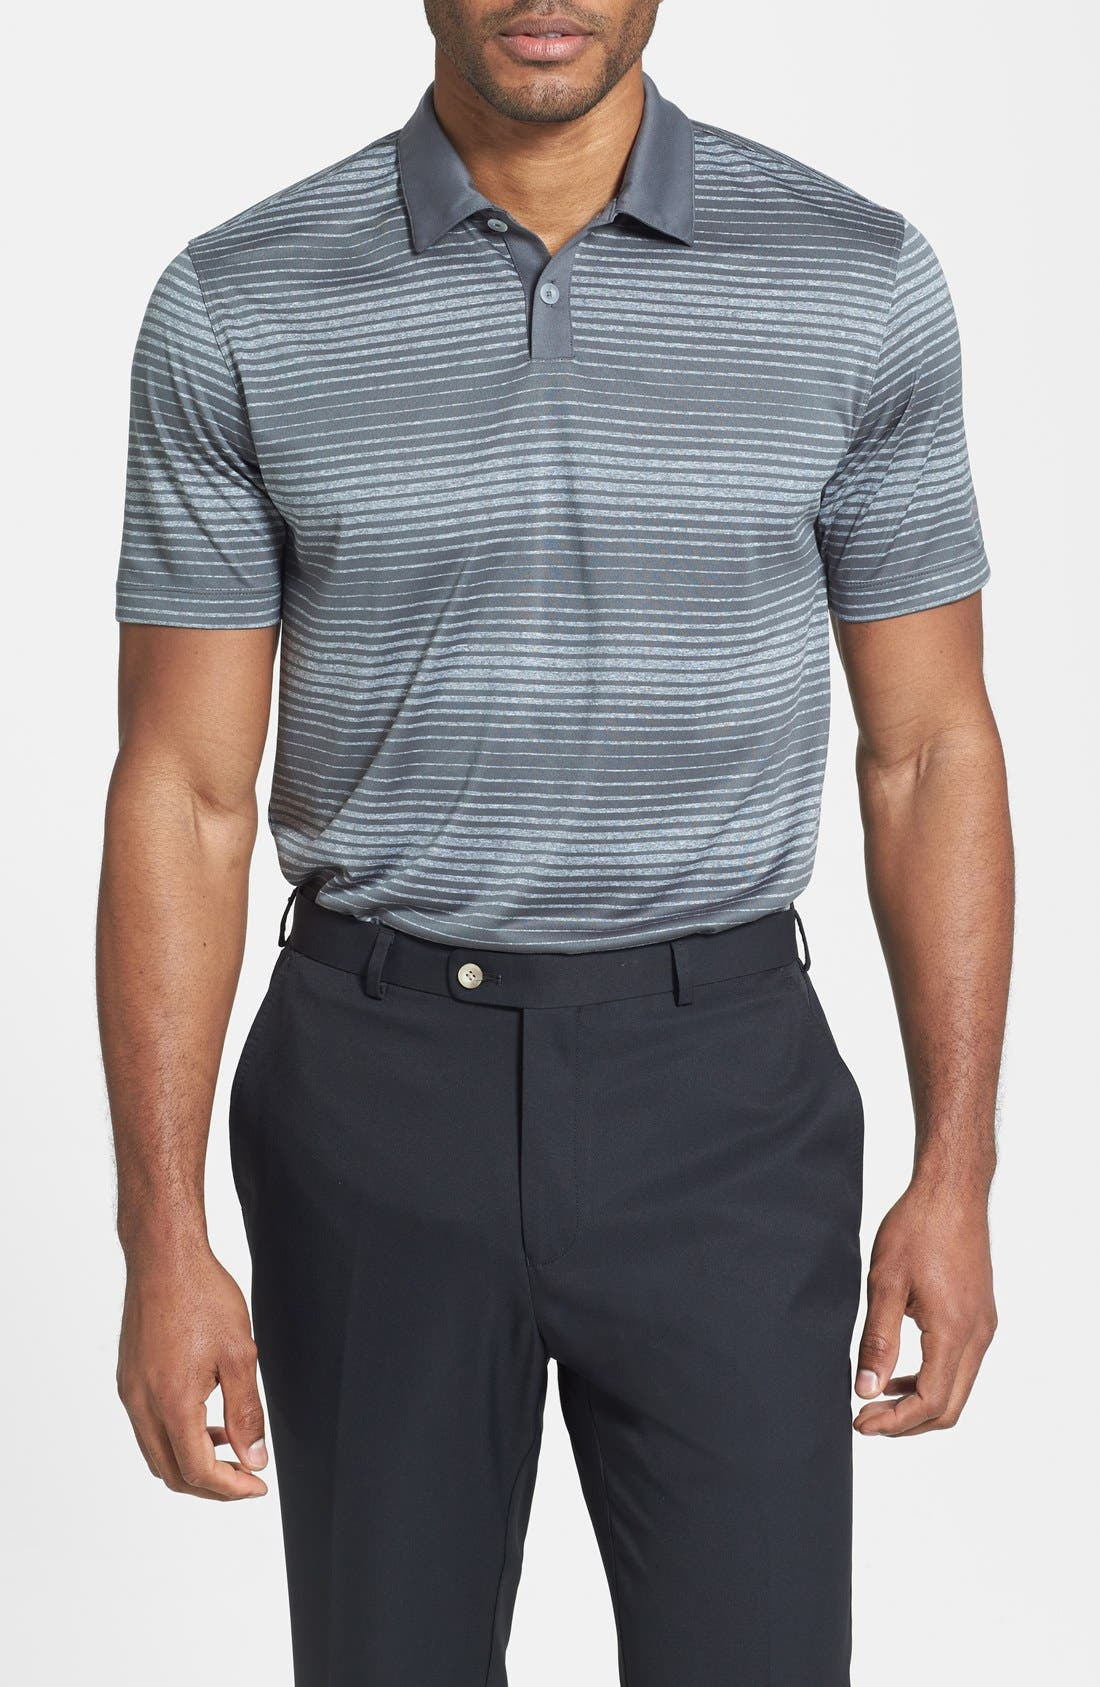 Main Image - Nike 'Innovation' Stripe Dri-FIT Polo